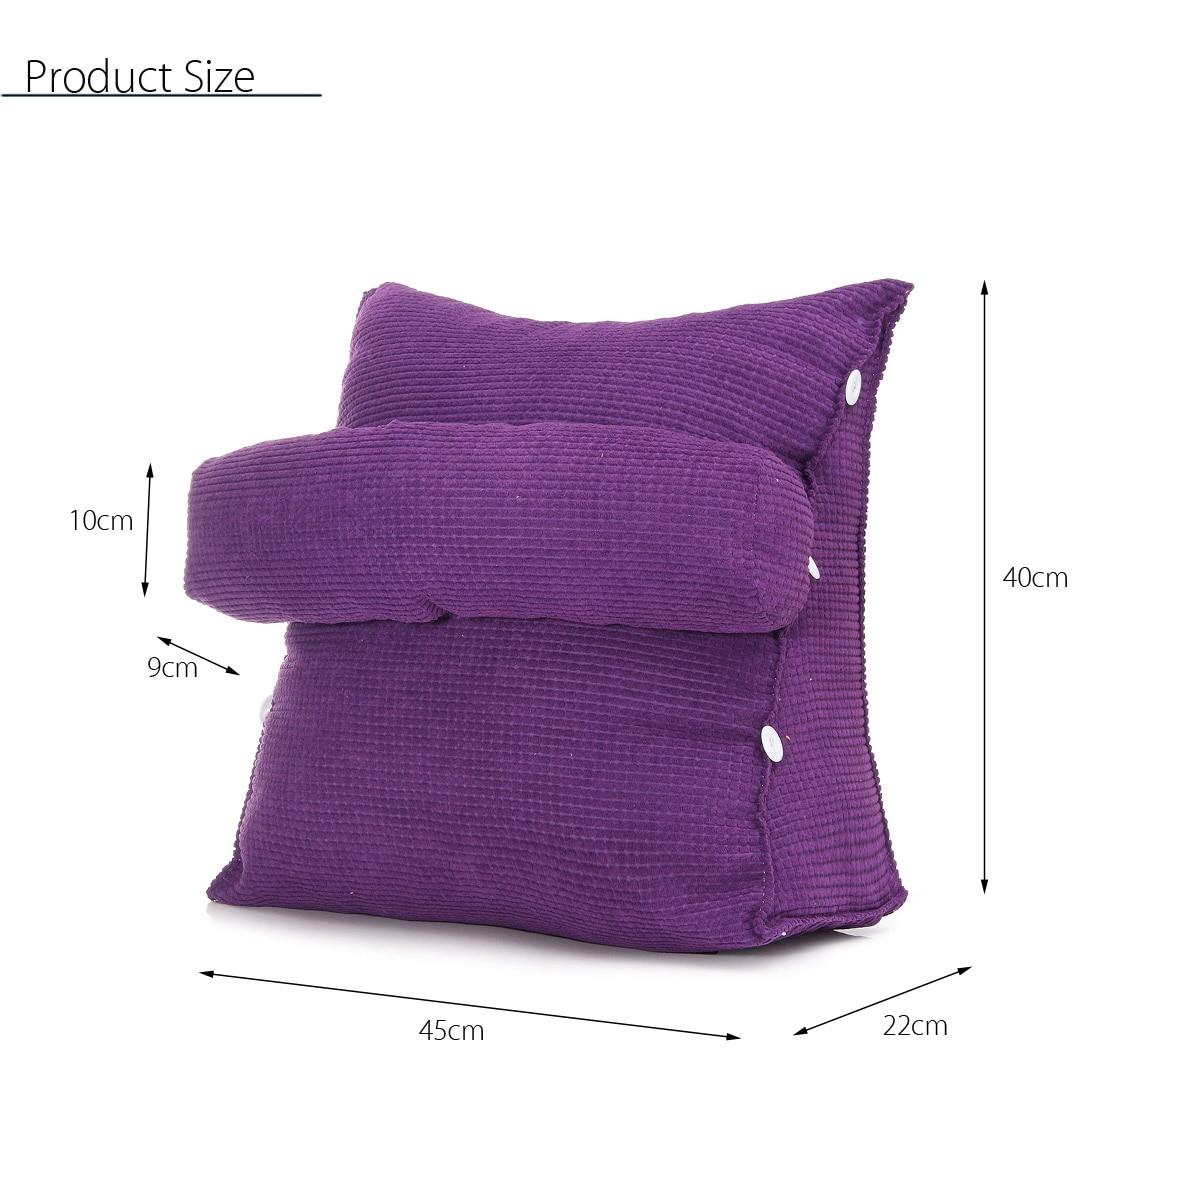 HTB1j1I5X2fsK1RjSszgq6yXzpXag Triangle Sofa Cushion Back Pillow Bed Backrest Office Chair Pillow Support Waist Cushion Lounger TV Reading Lumbar Home Decor